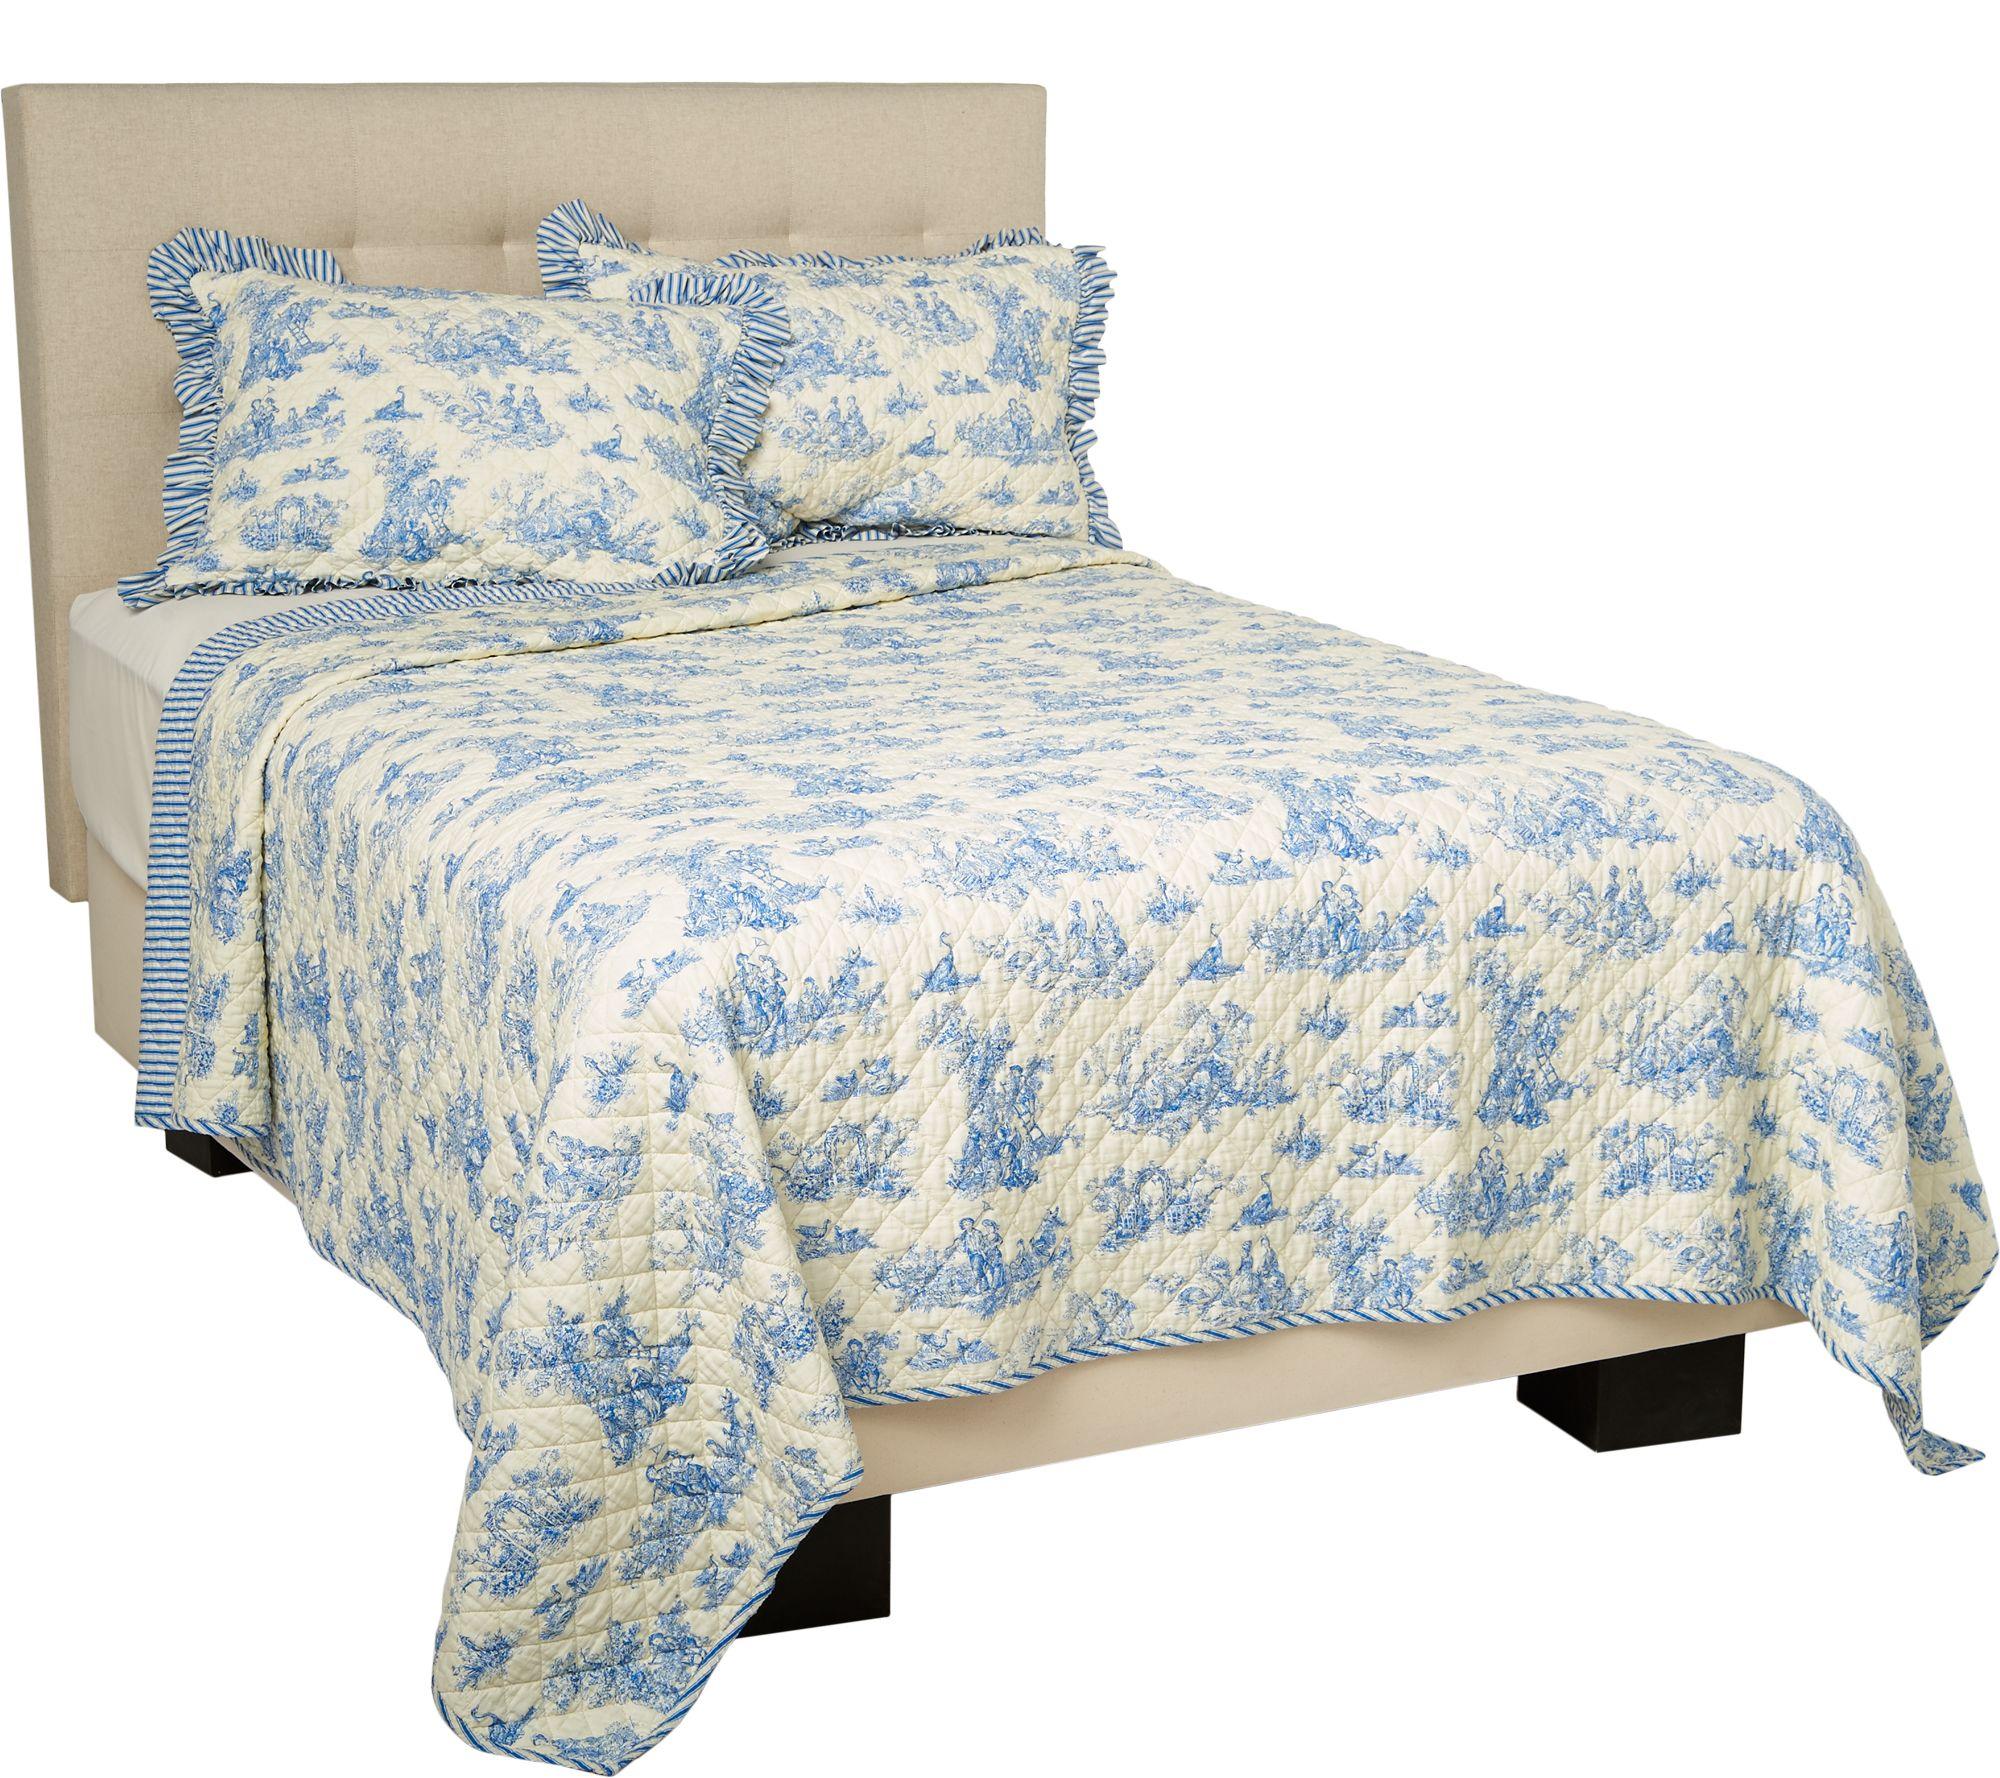 Top 100% Cotton Reversible Toile Quilt with Shams - Page 1 — QVC.com UT77